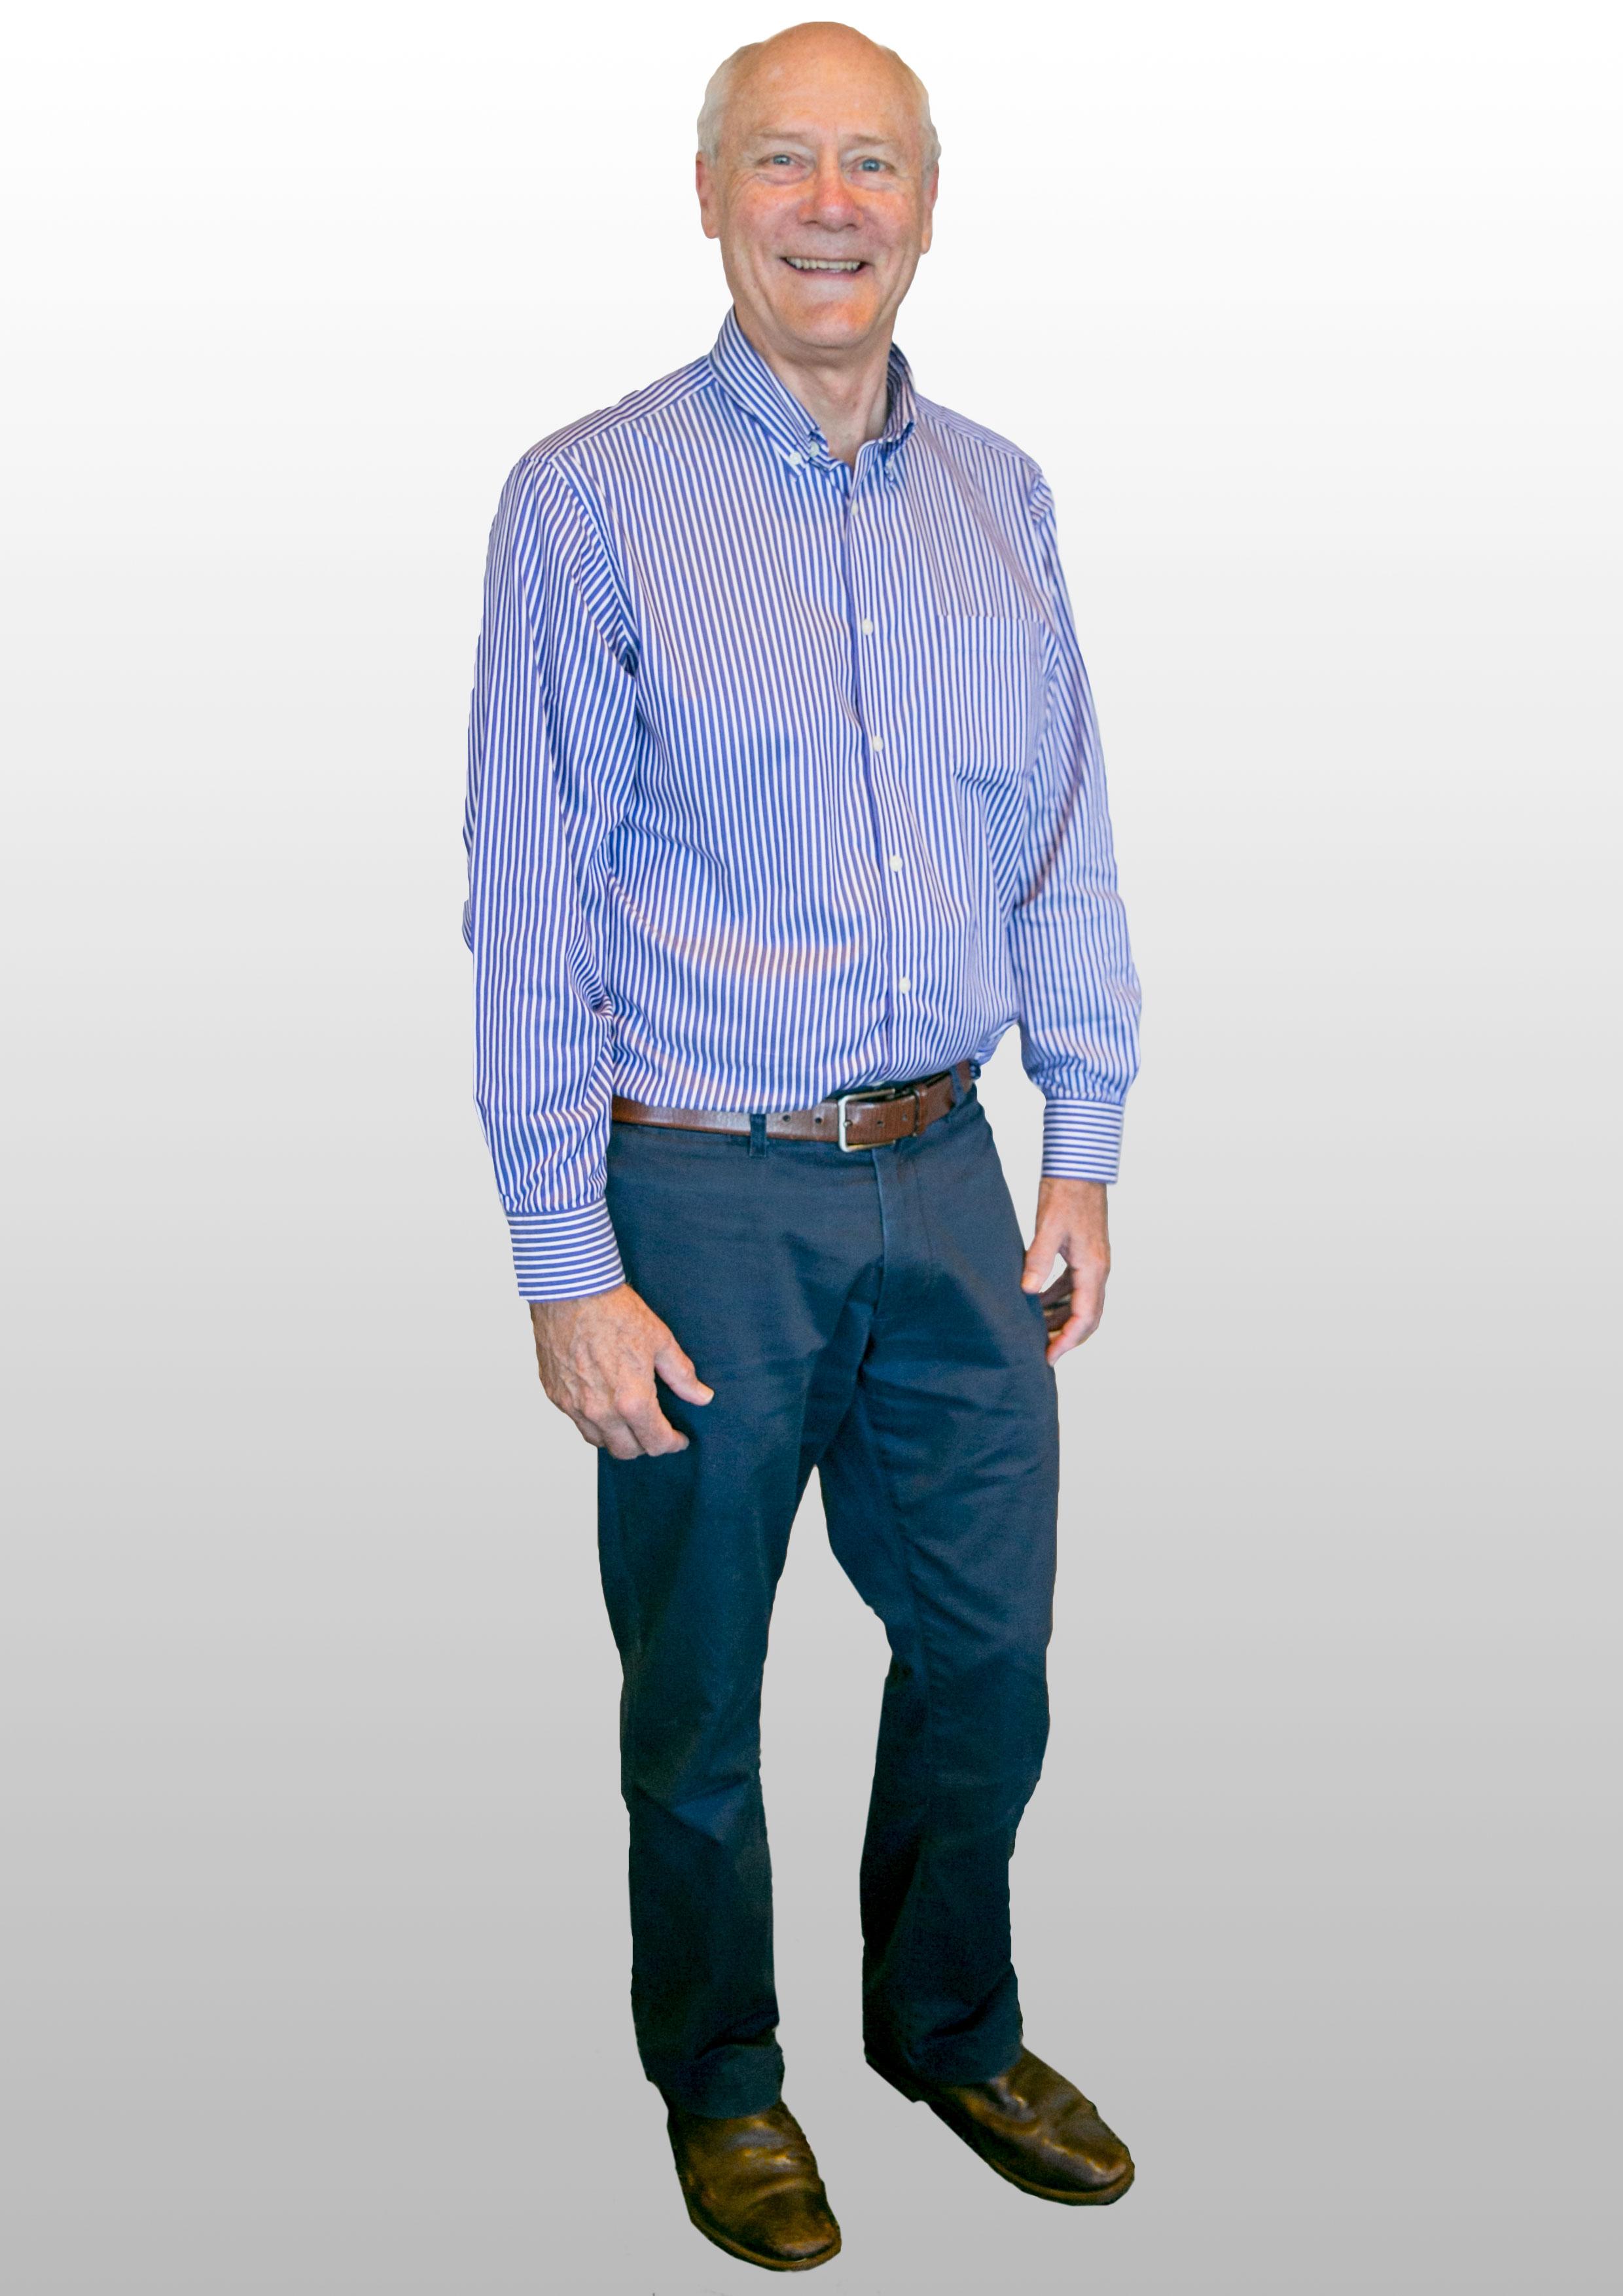 Buchan Non-Executive Chairman Frank Zipfinger